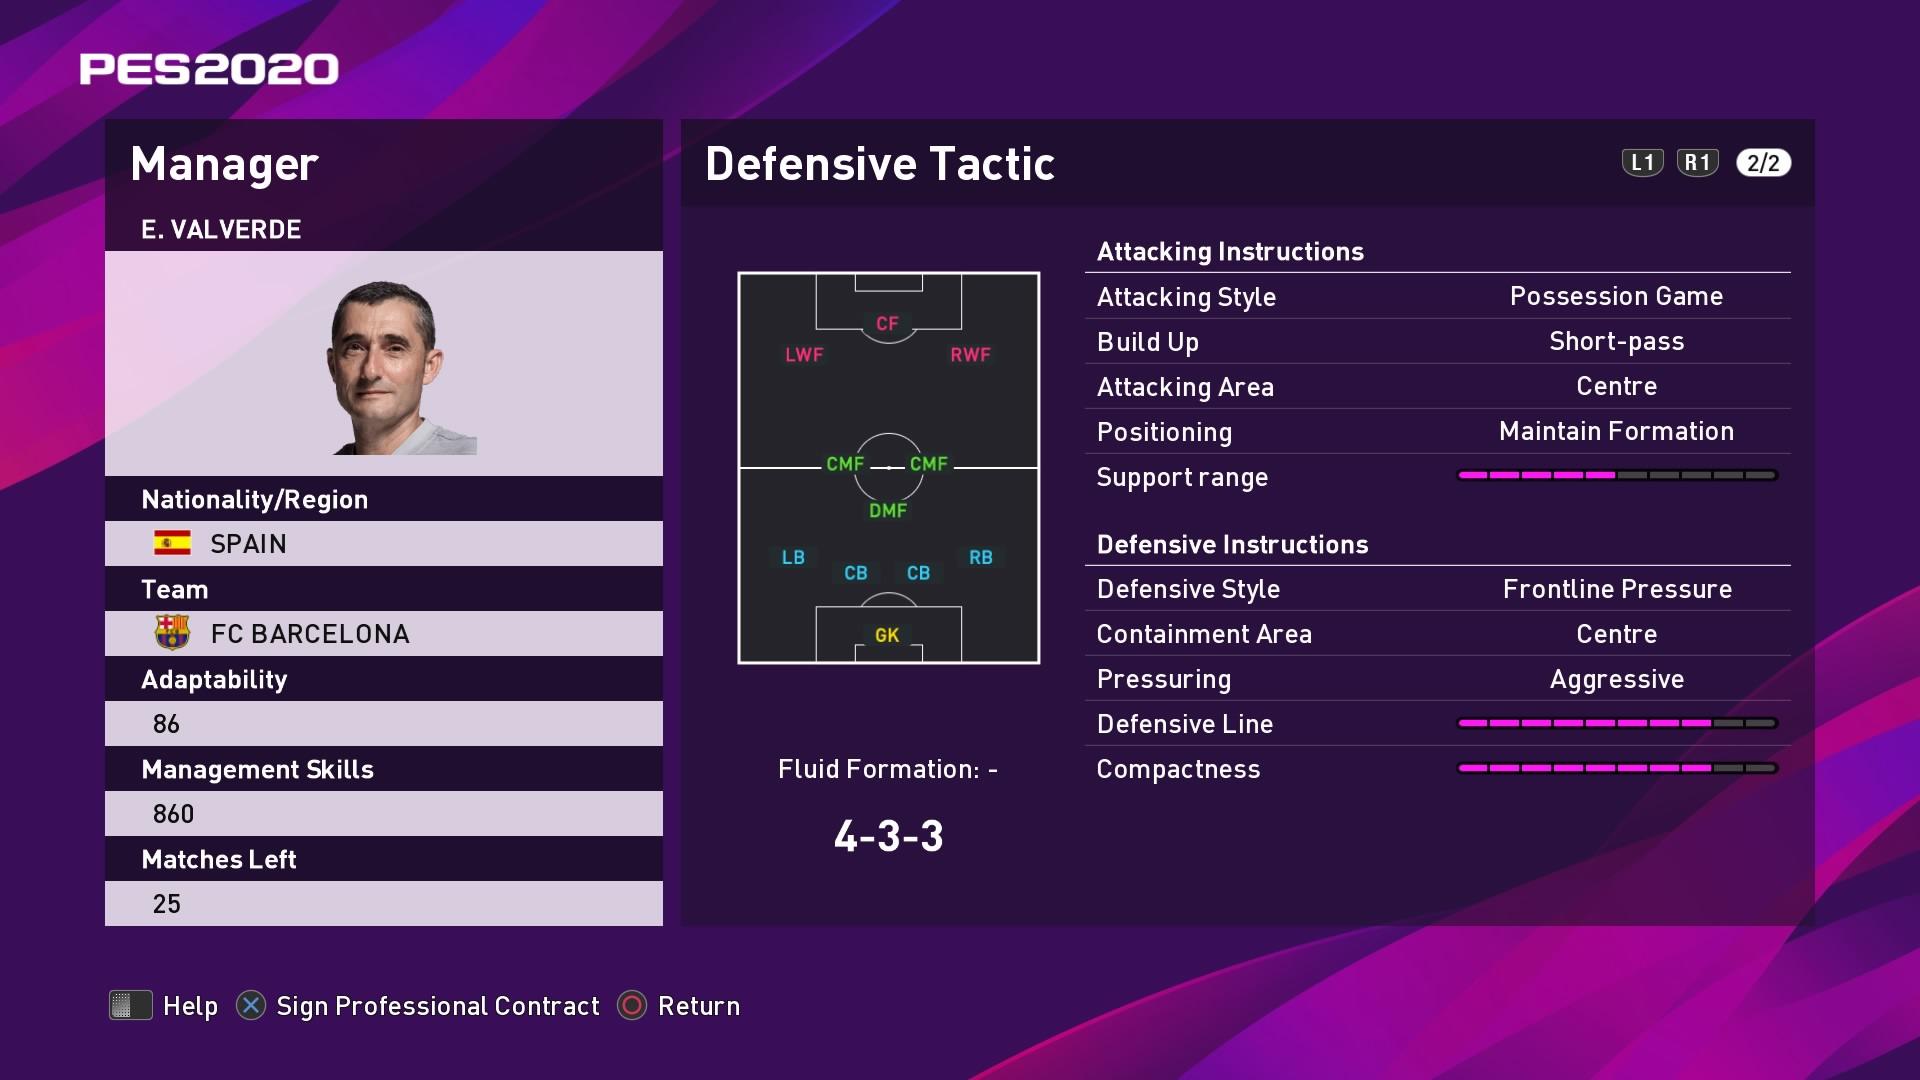 E. Valverde (Ernesto Valverde) Defensive Tactic in PES 2020 myClub